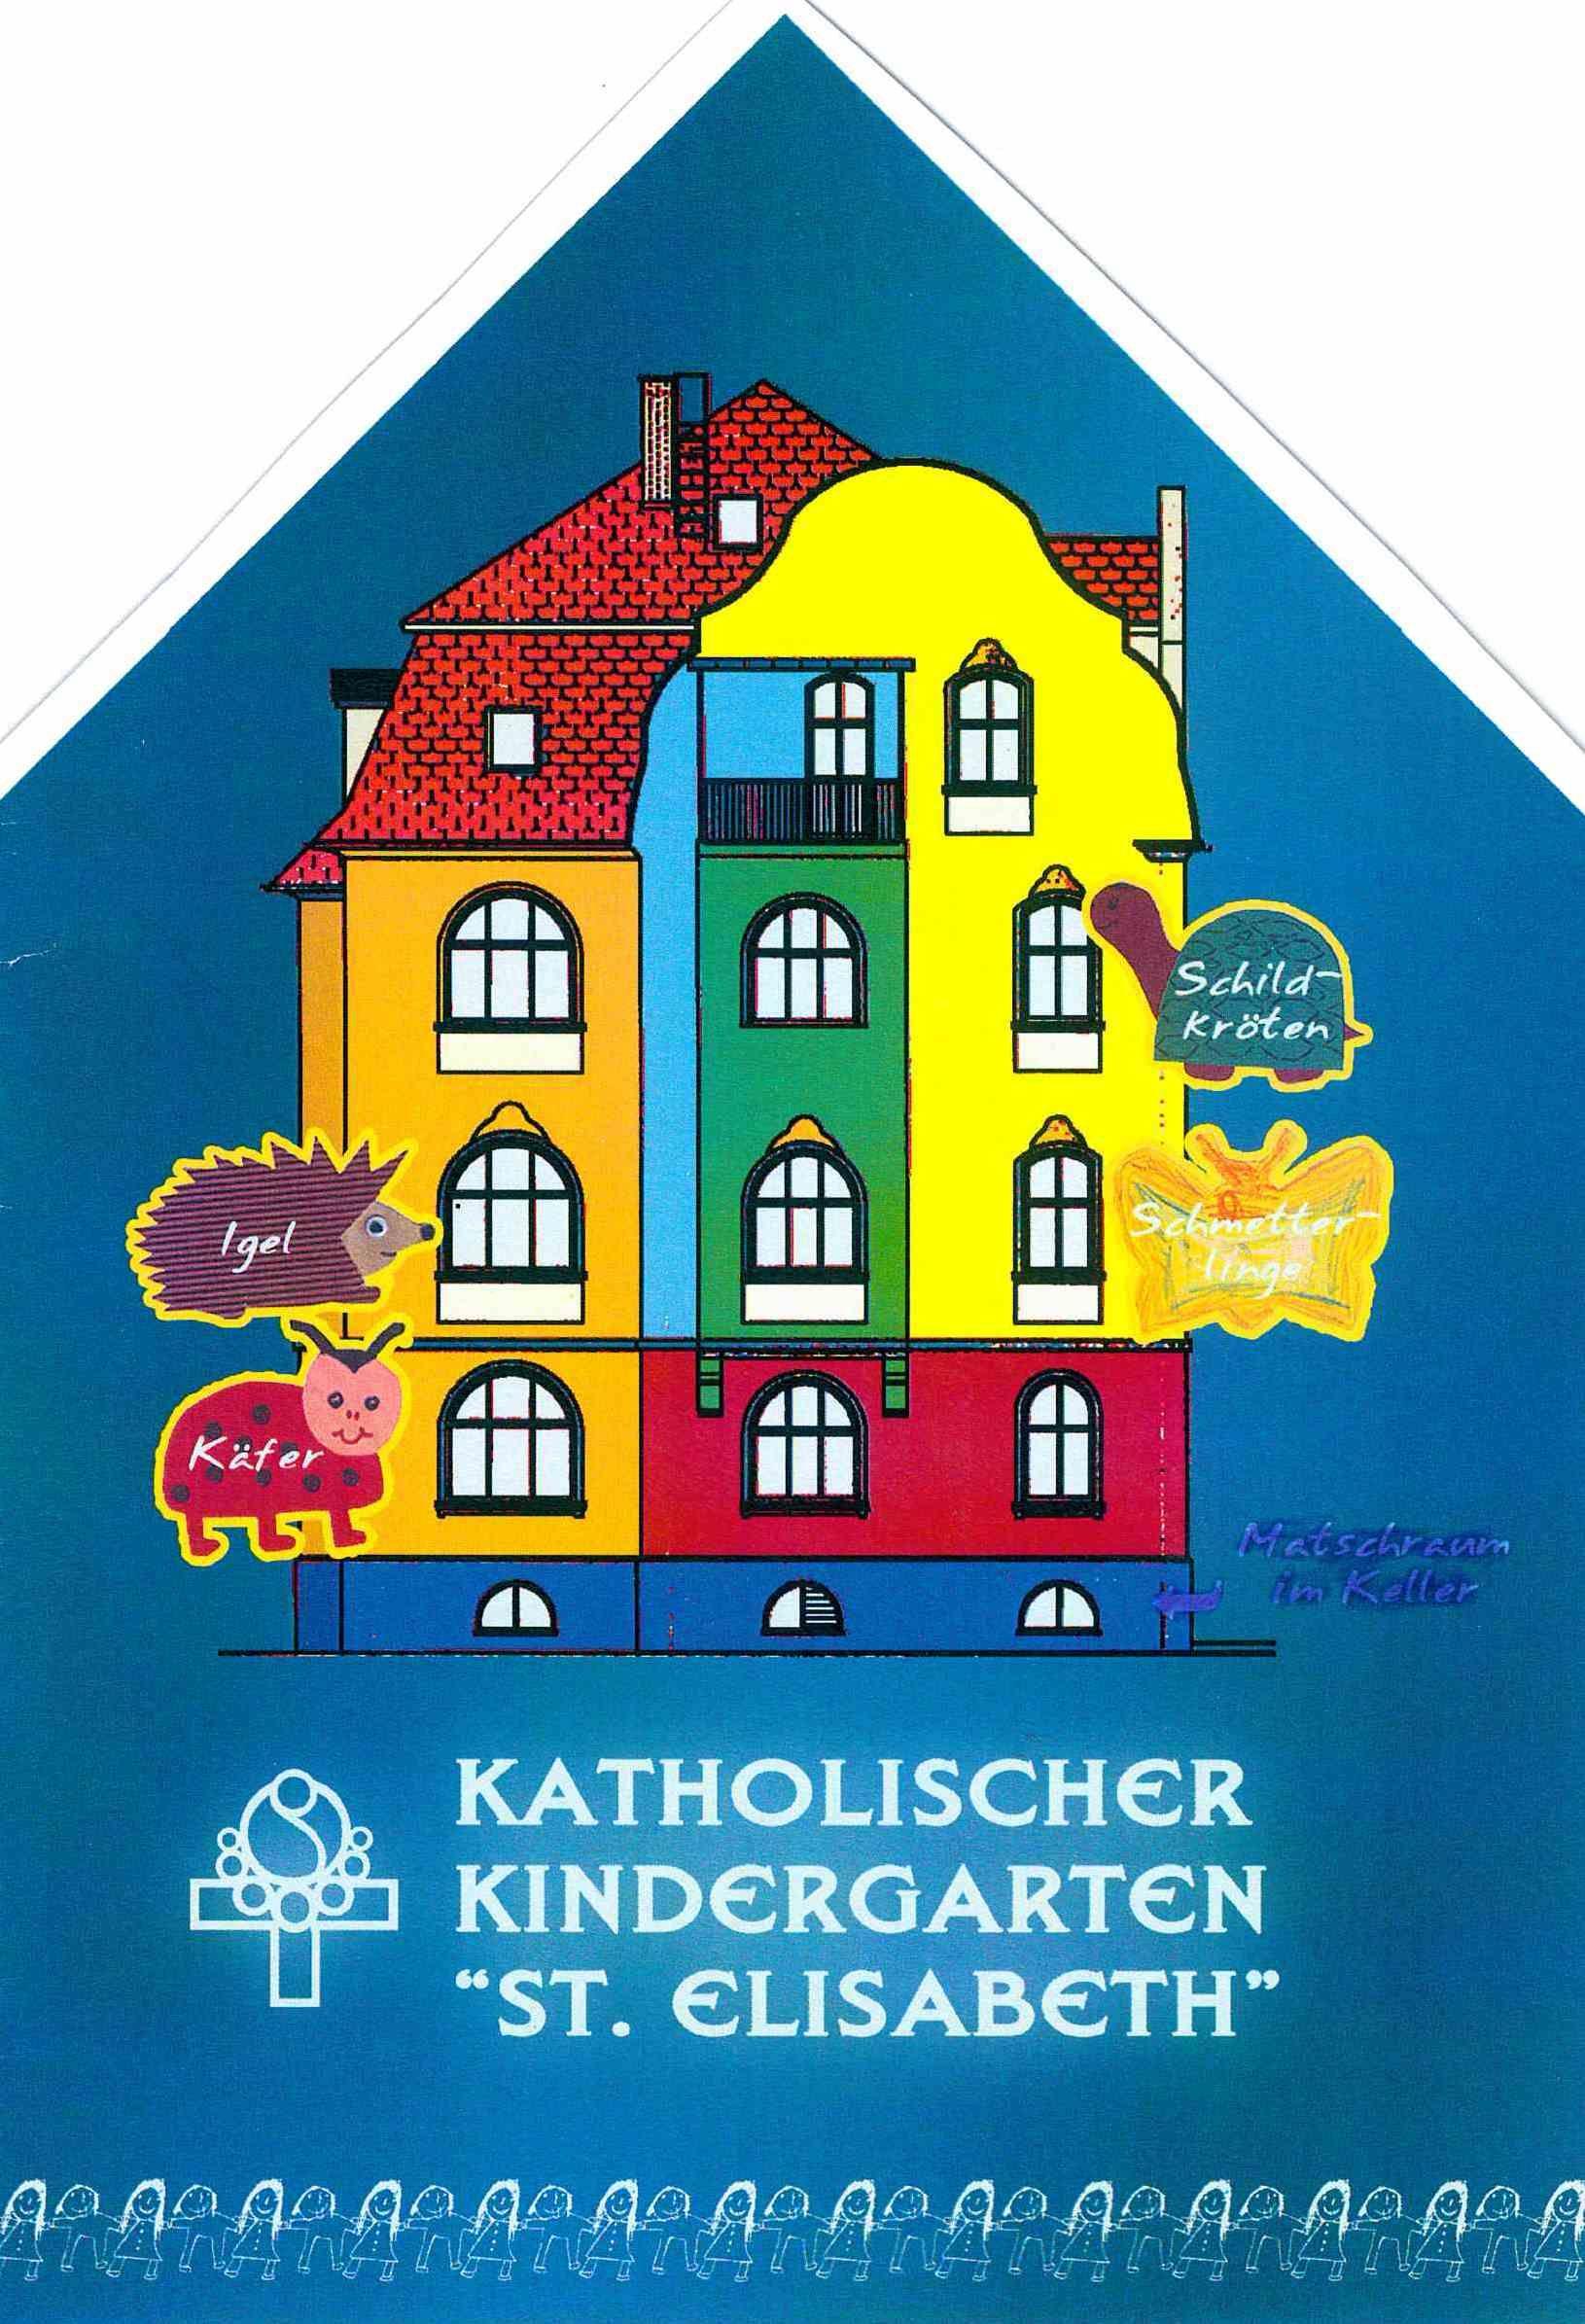 Prospekt zu unserem Kiga-Haus